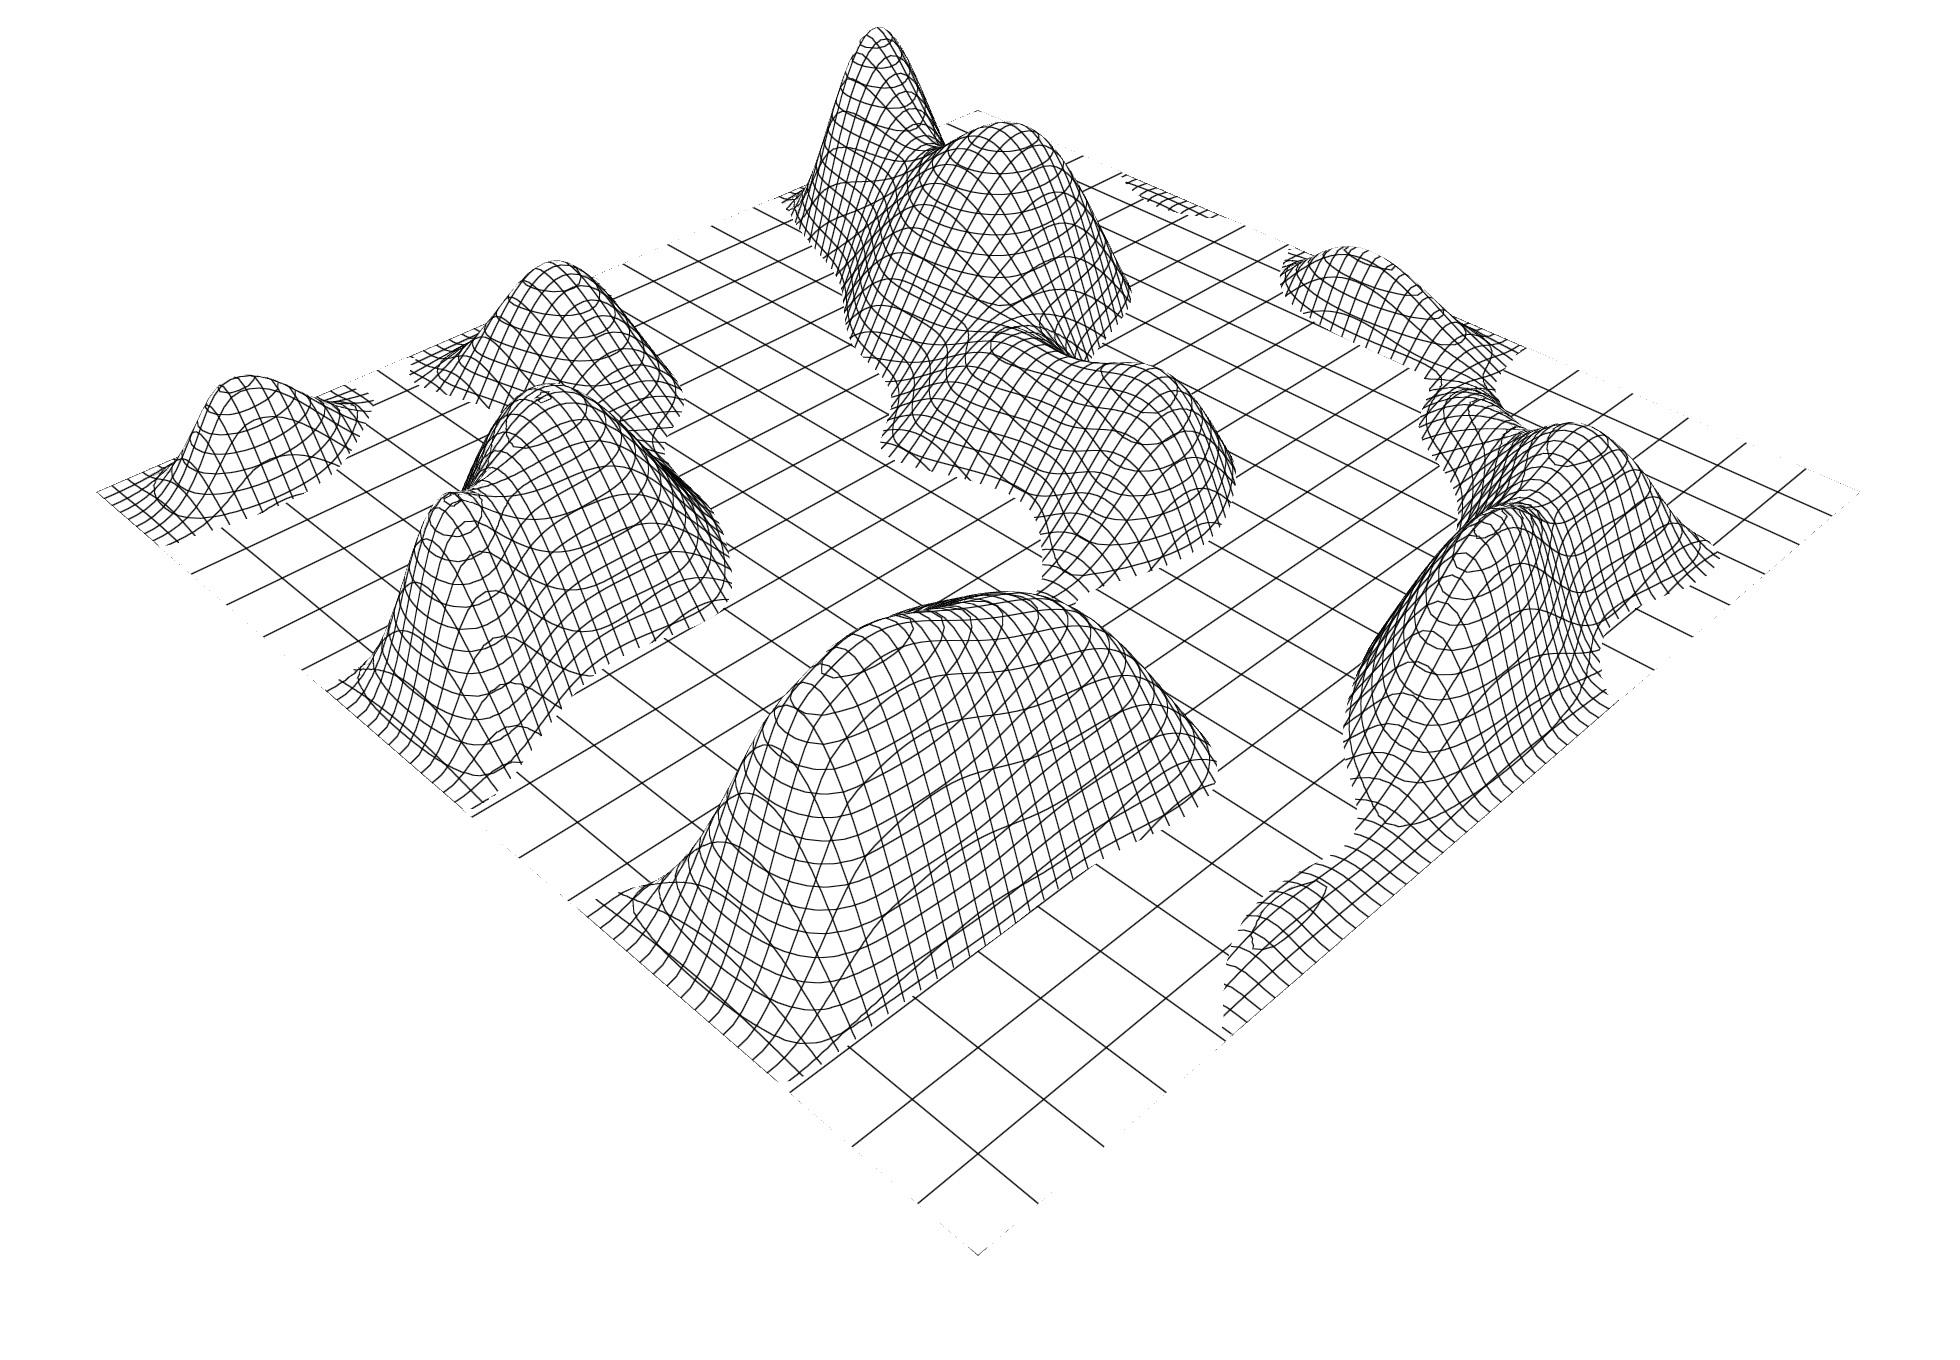 GitHub - ayamflow/glsl-grid: Draws an antialiased grid along the X/Y